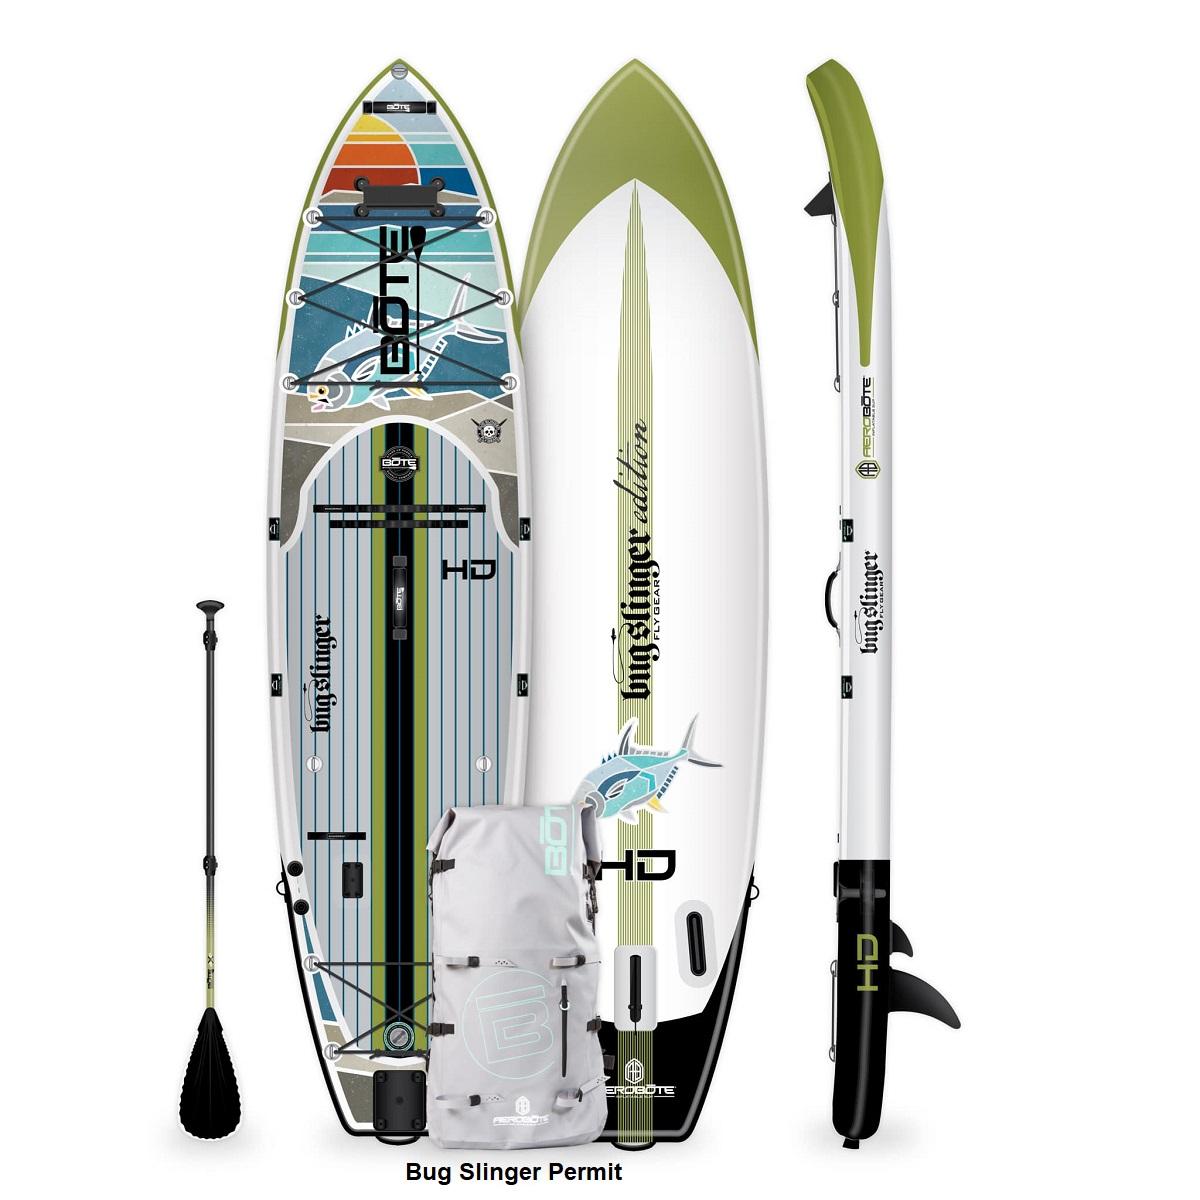 BOTE HD Aero Paddle Board - Bug Slinger Permit